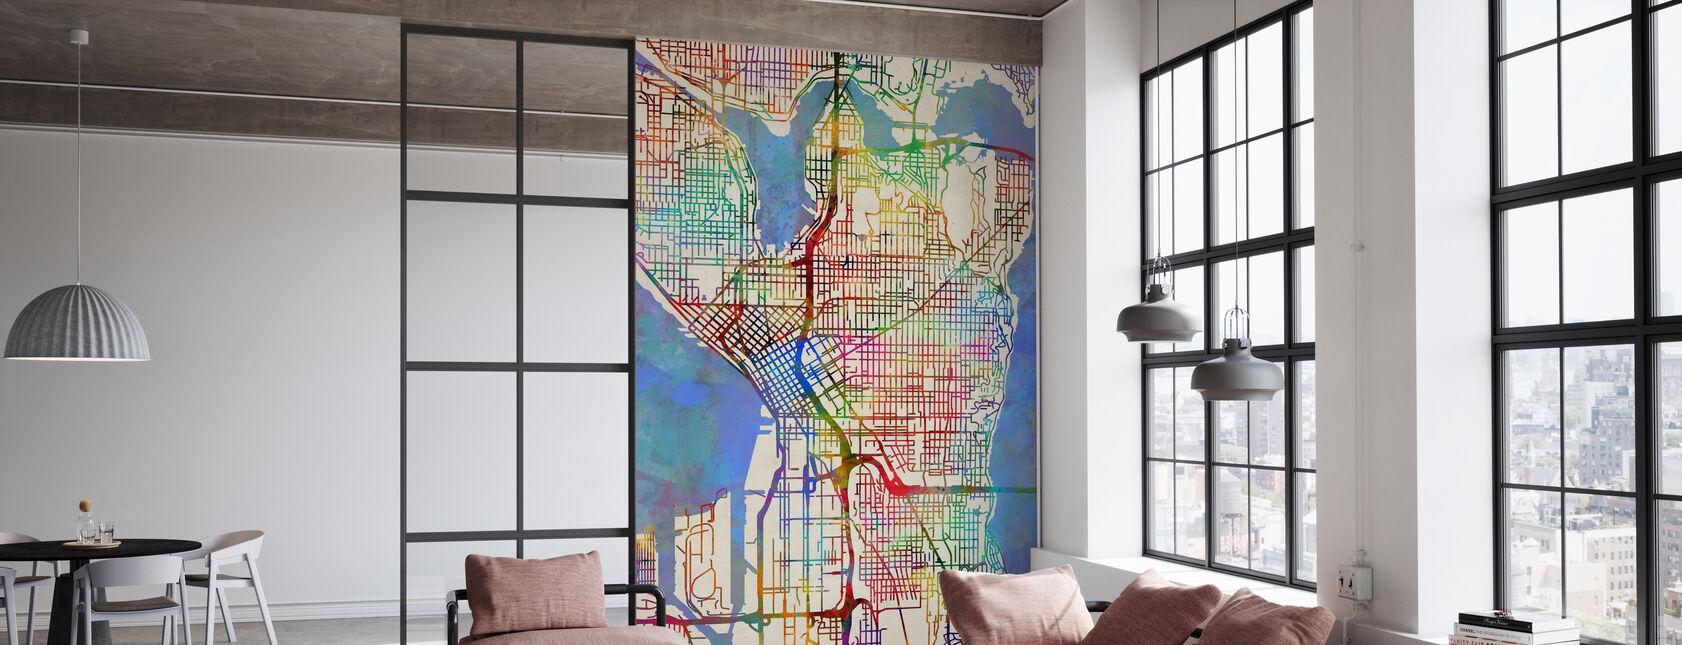 Seattle Washington Street Kaart - Behang - Kantoor